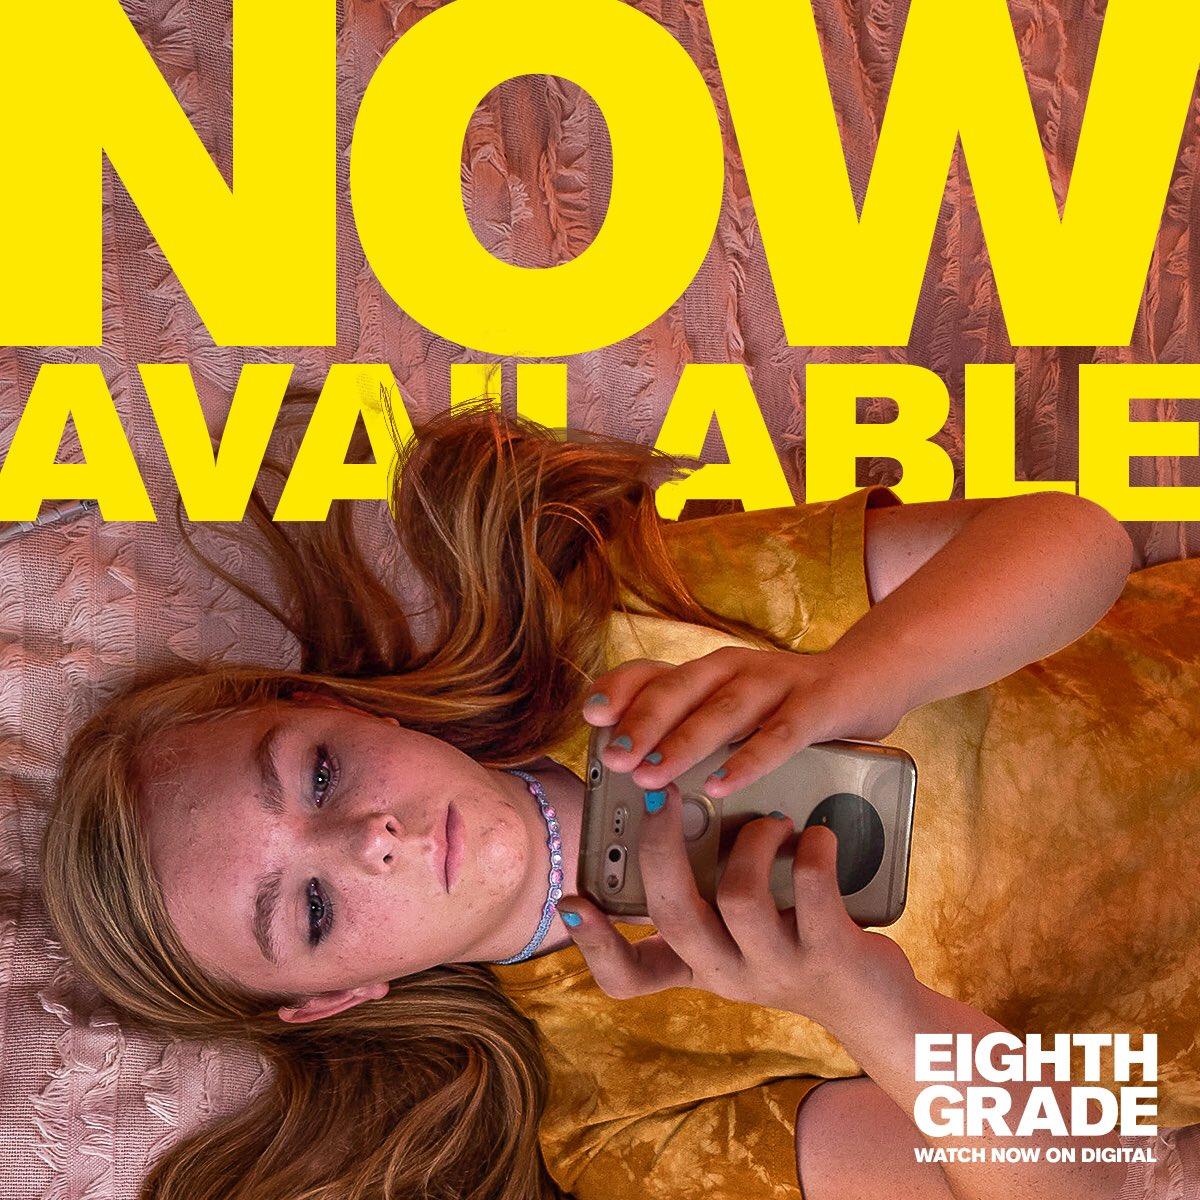 Hey hey hey hey. Hey. GUYS. Eighth grade is out digital right NOW! bit.ly/EighthGrade_Wa… please go watch it...